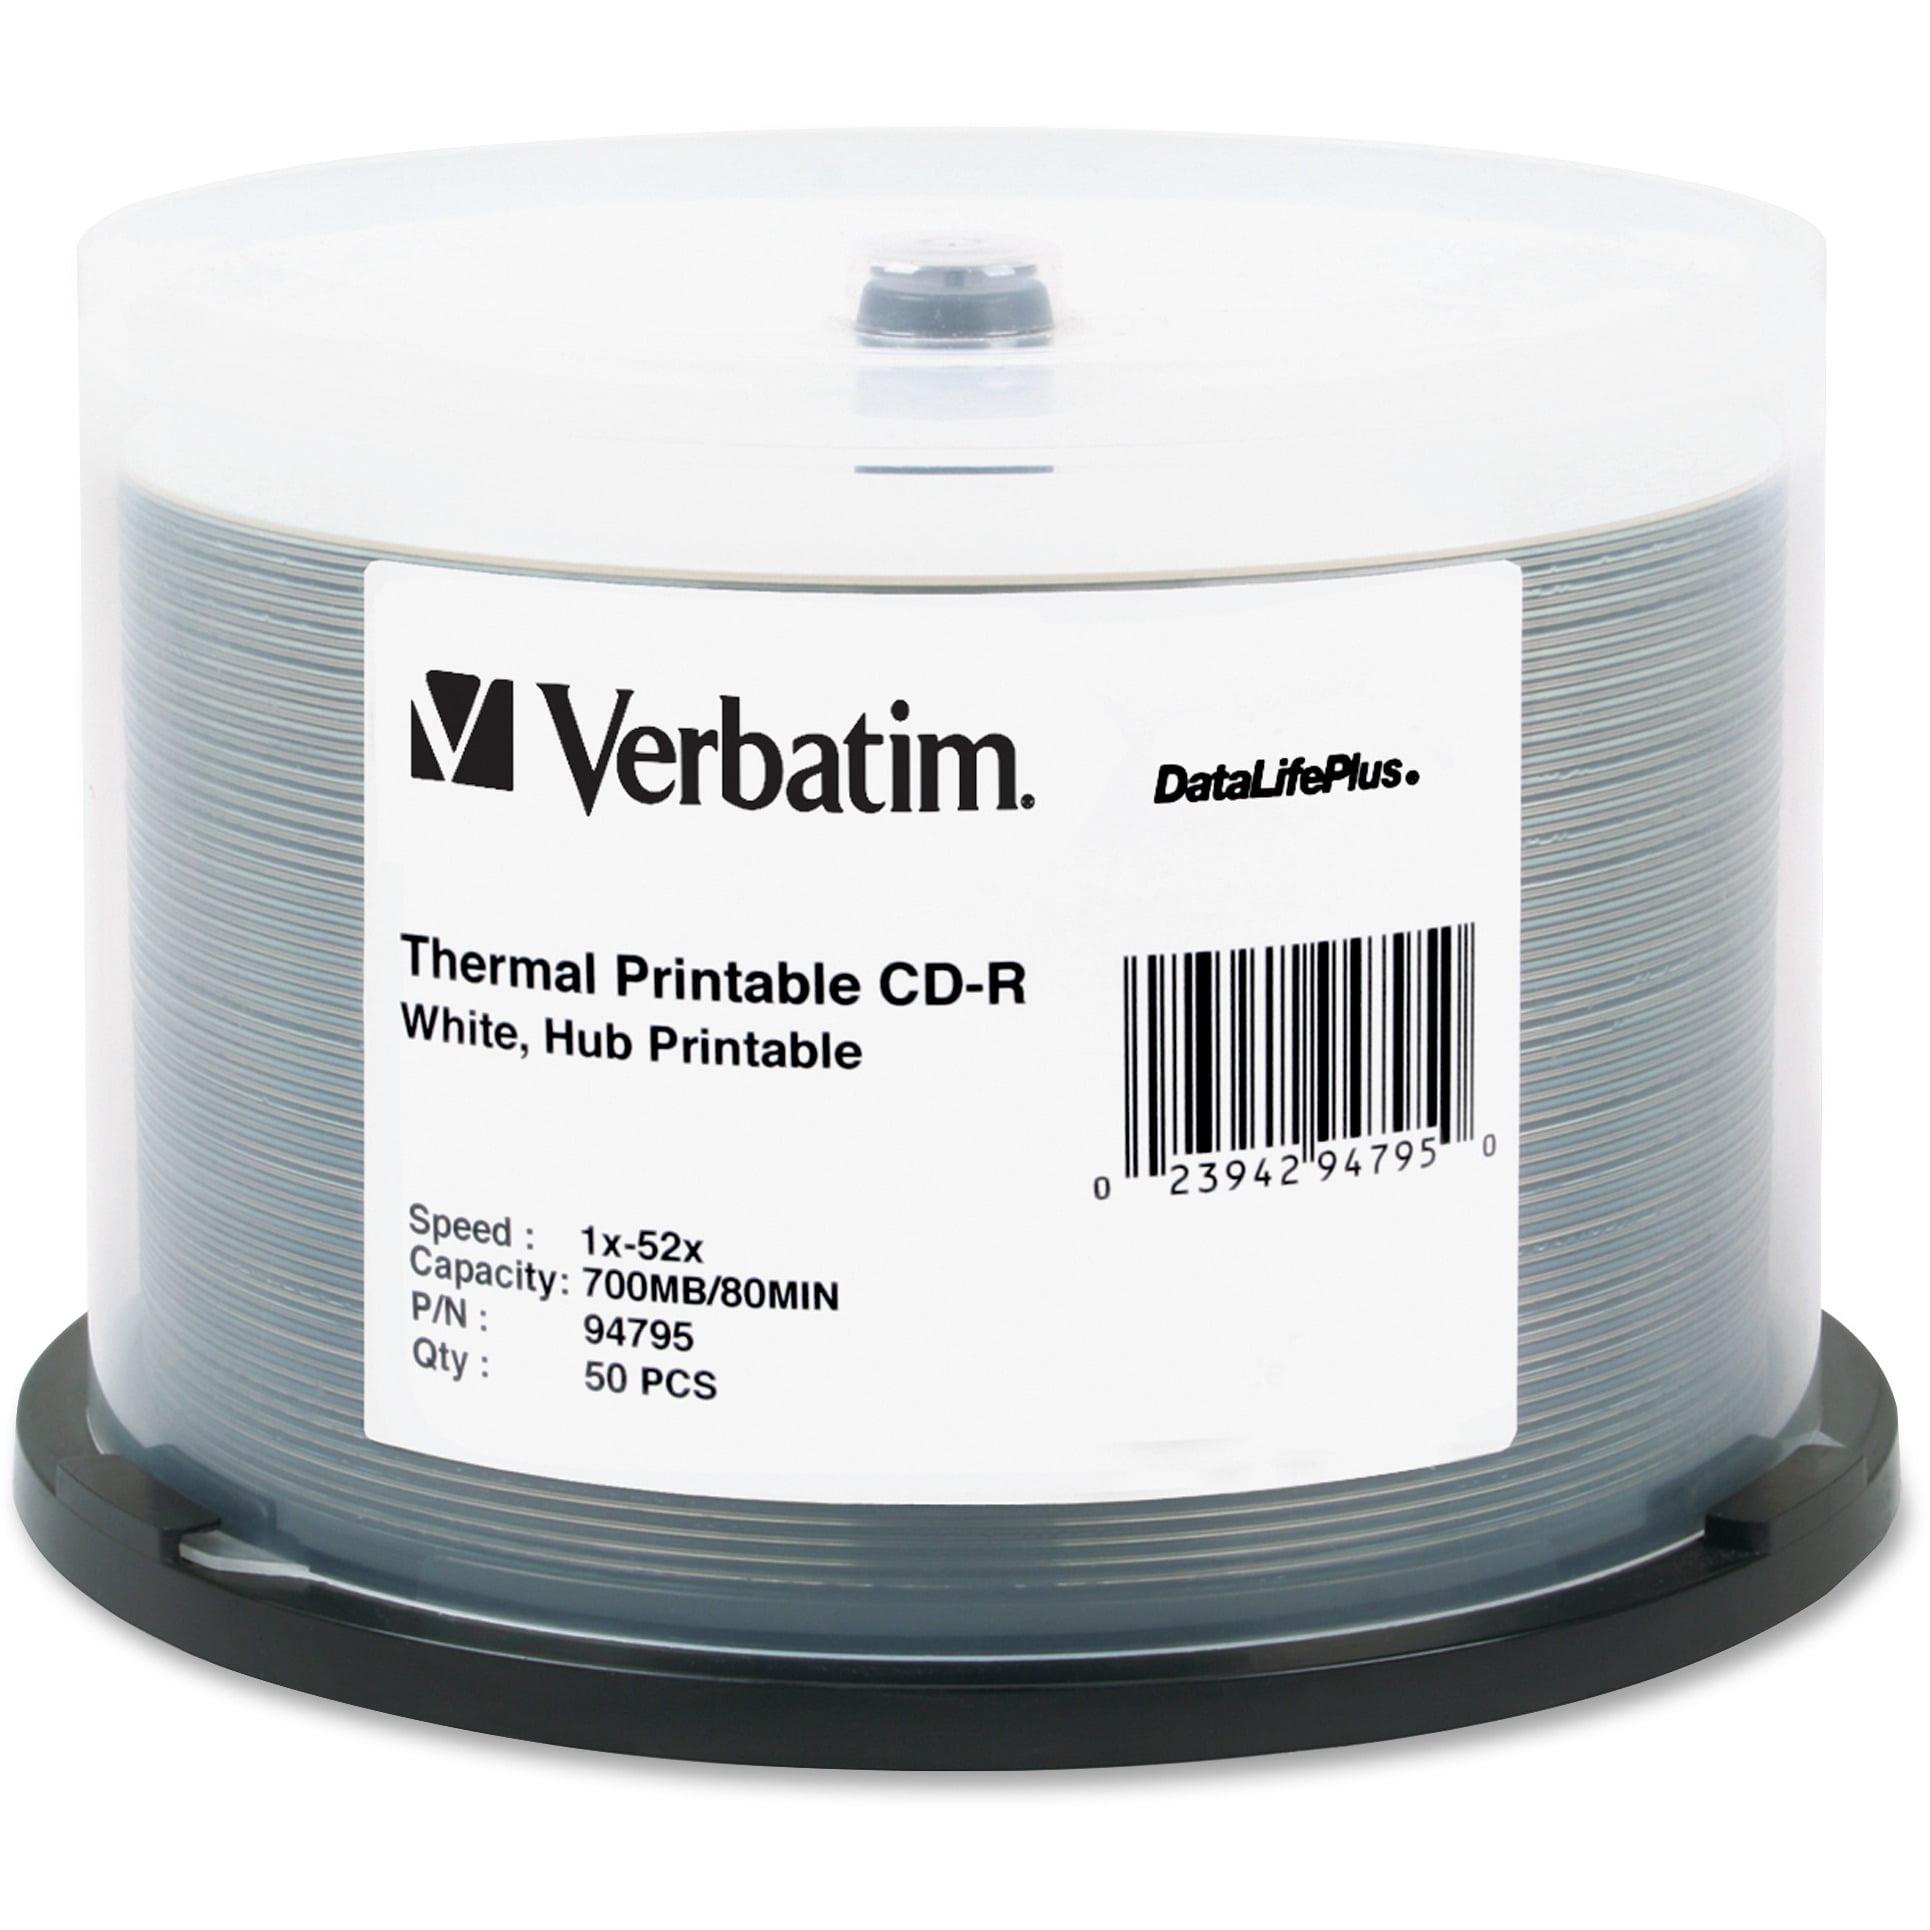 Verbatim, VER94795, Verbatim DataLife Plus White Thermal CD-R, 50, White